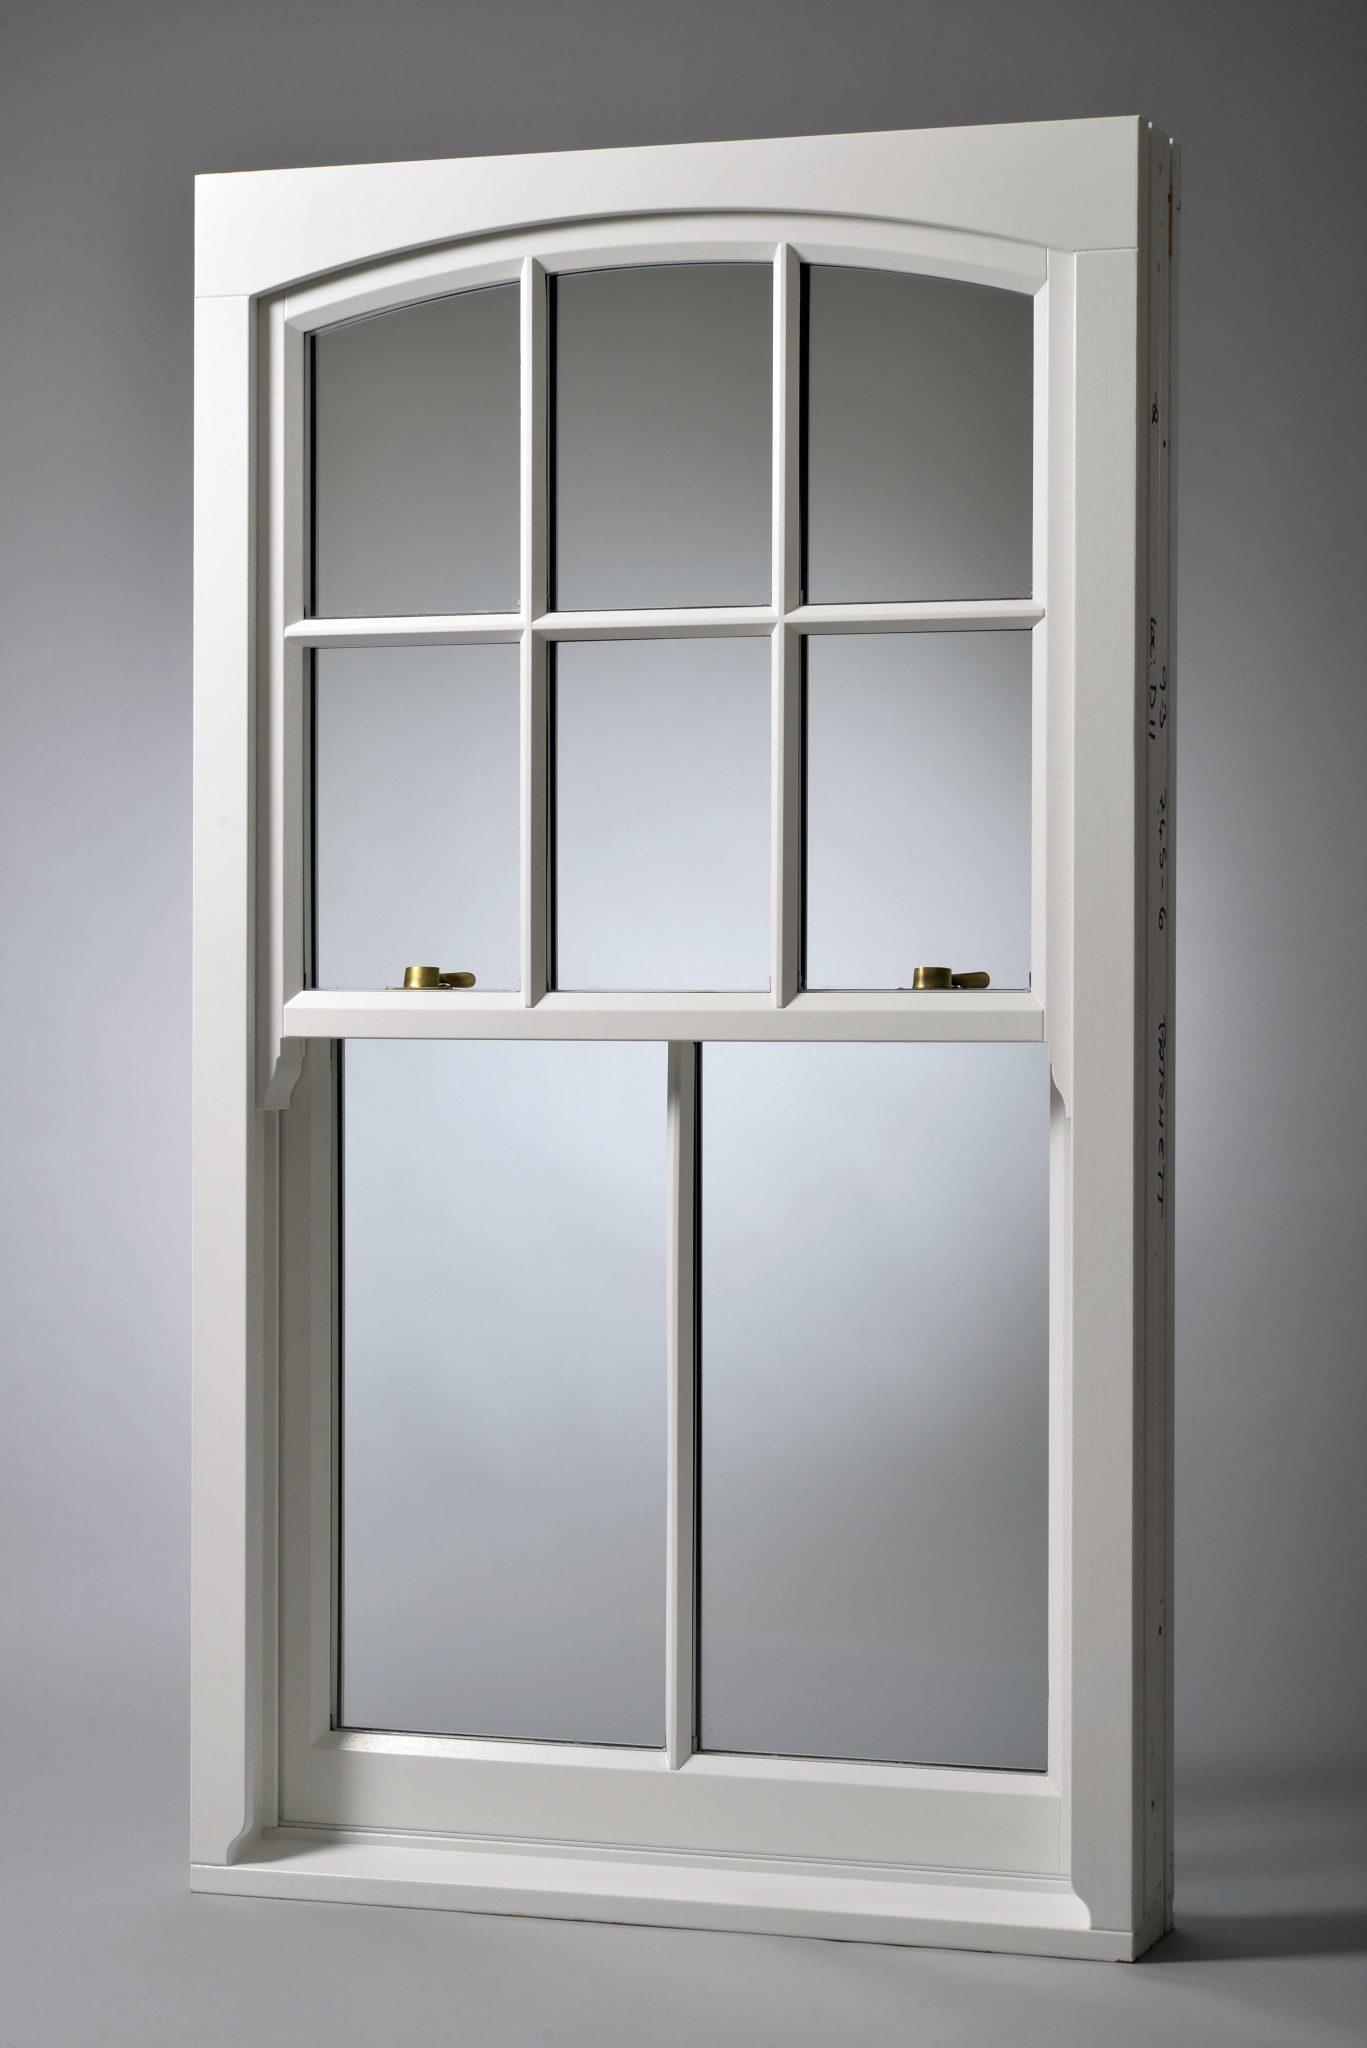 Spiral balance timber sliding sash windows for Sash window design